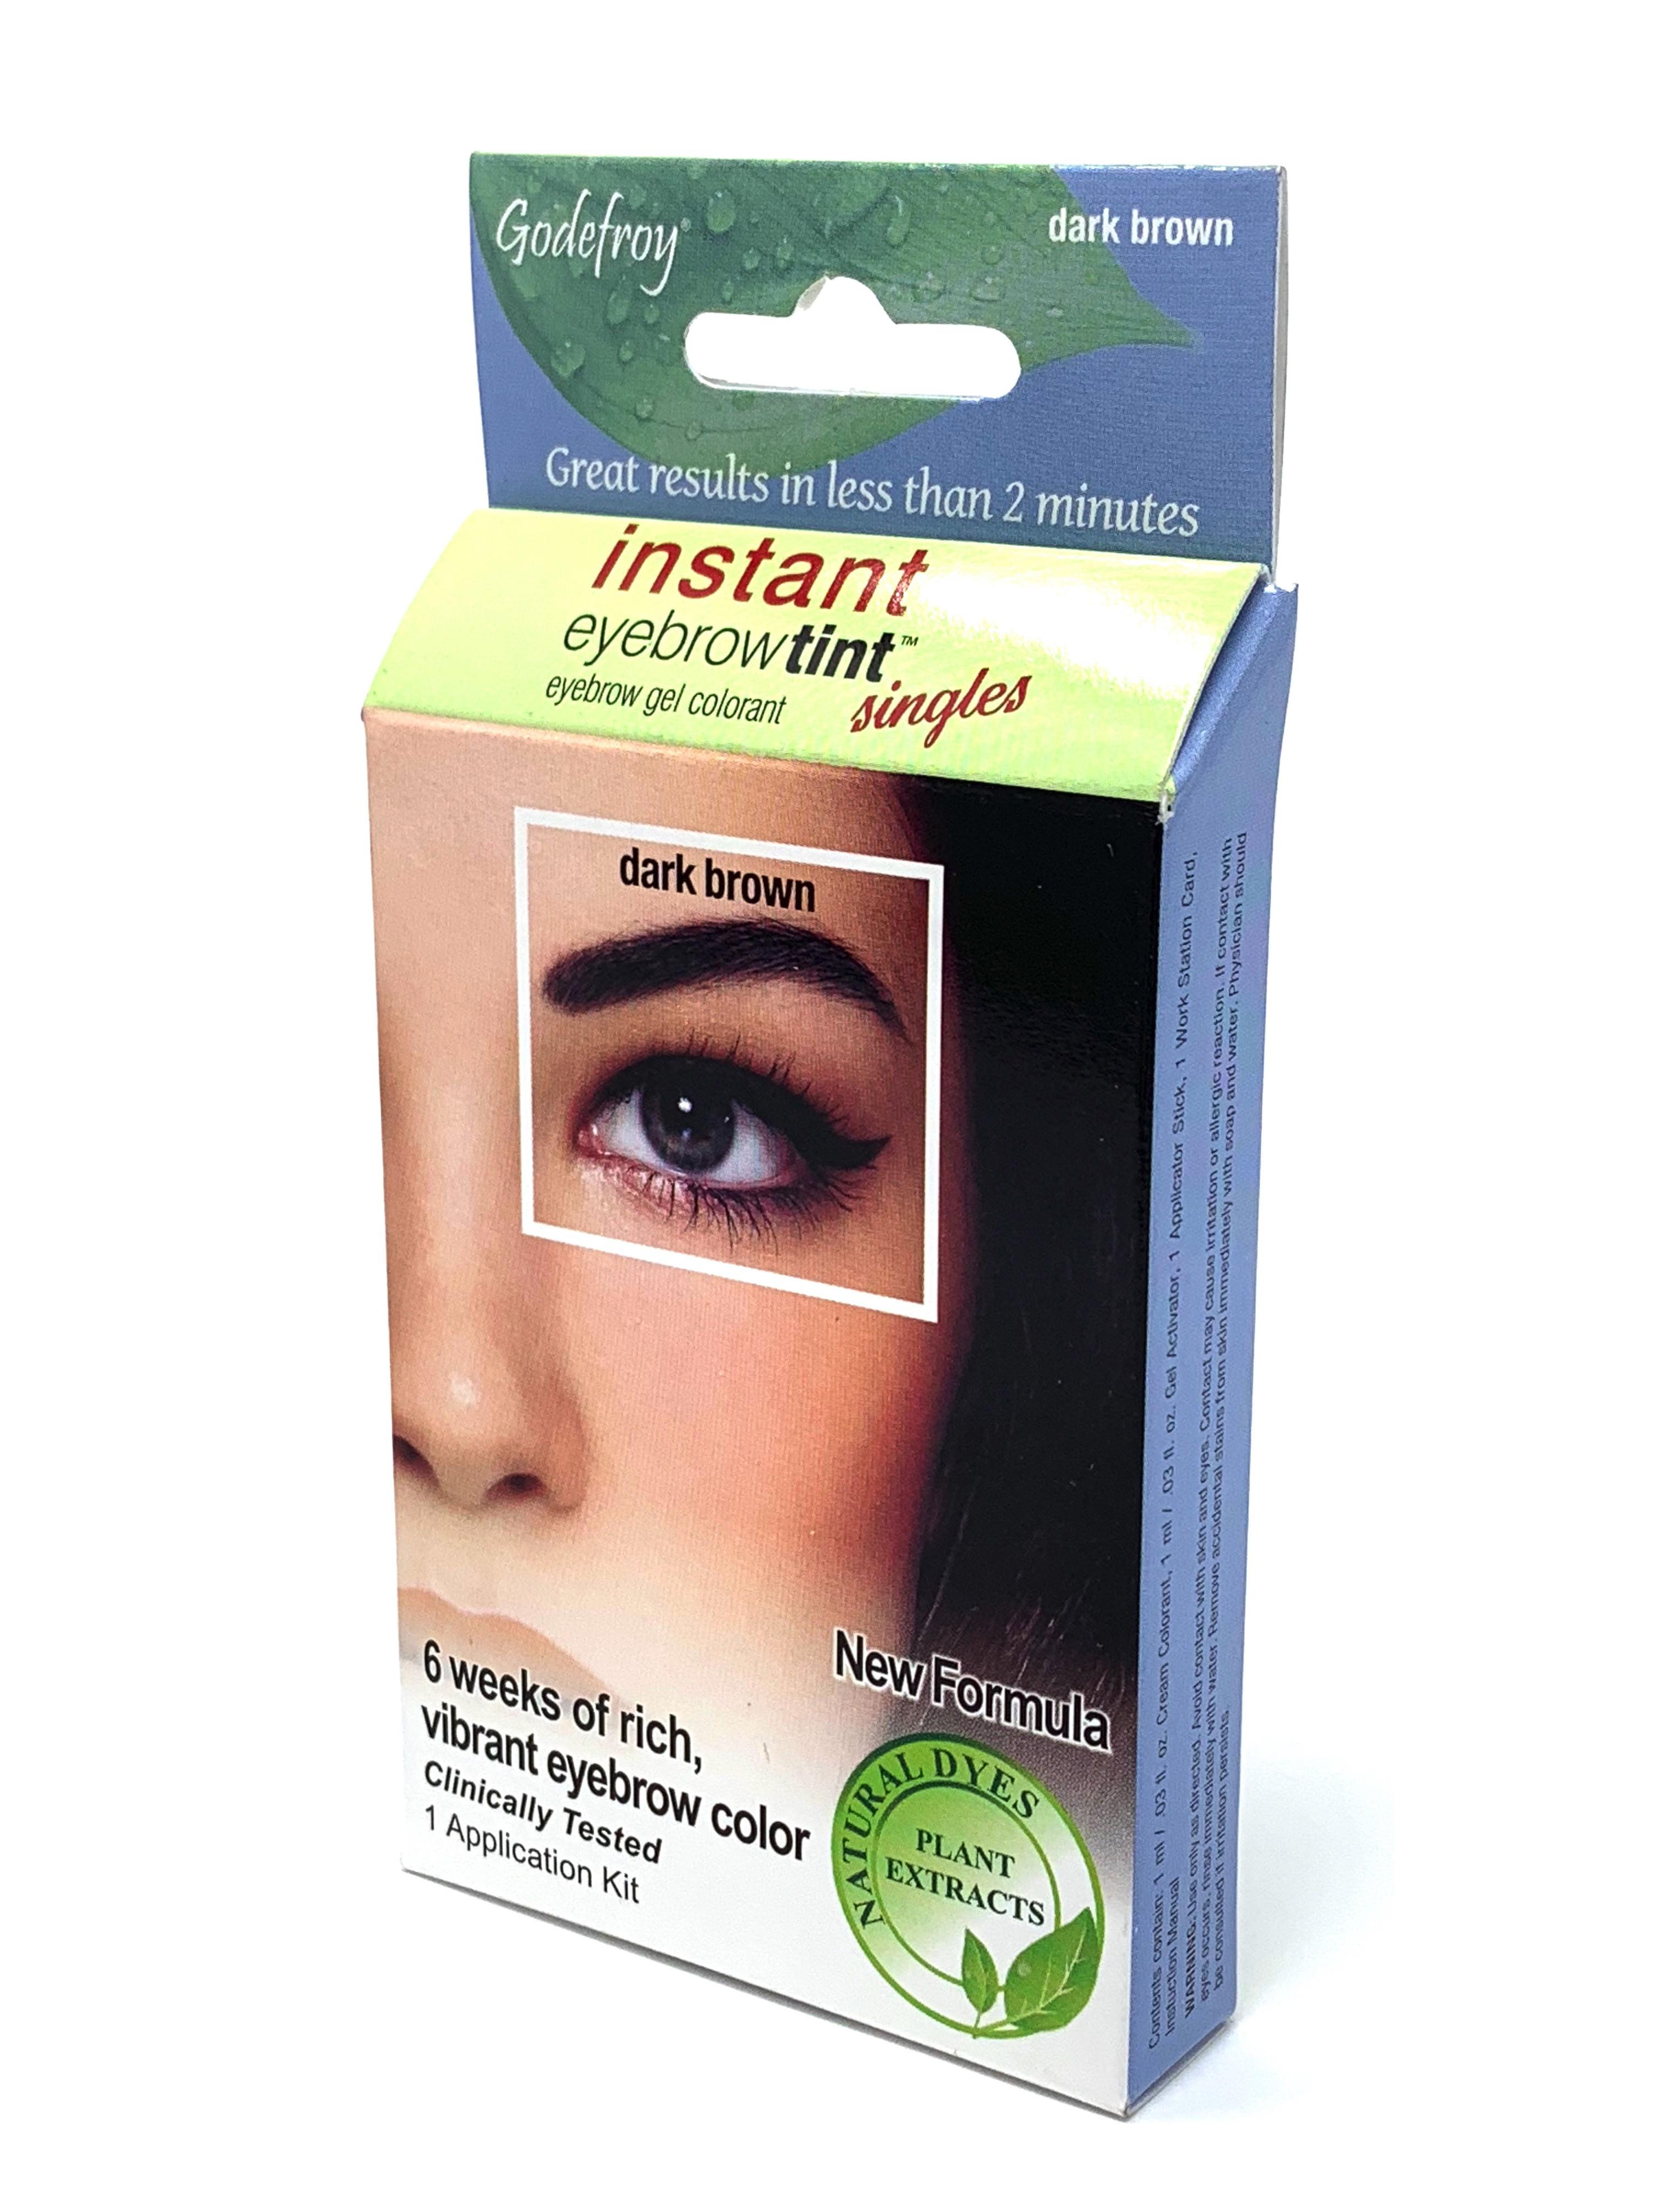 Godefroy Instant Eyebrow Tint Dark Brown Single Application